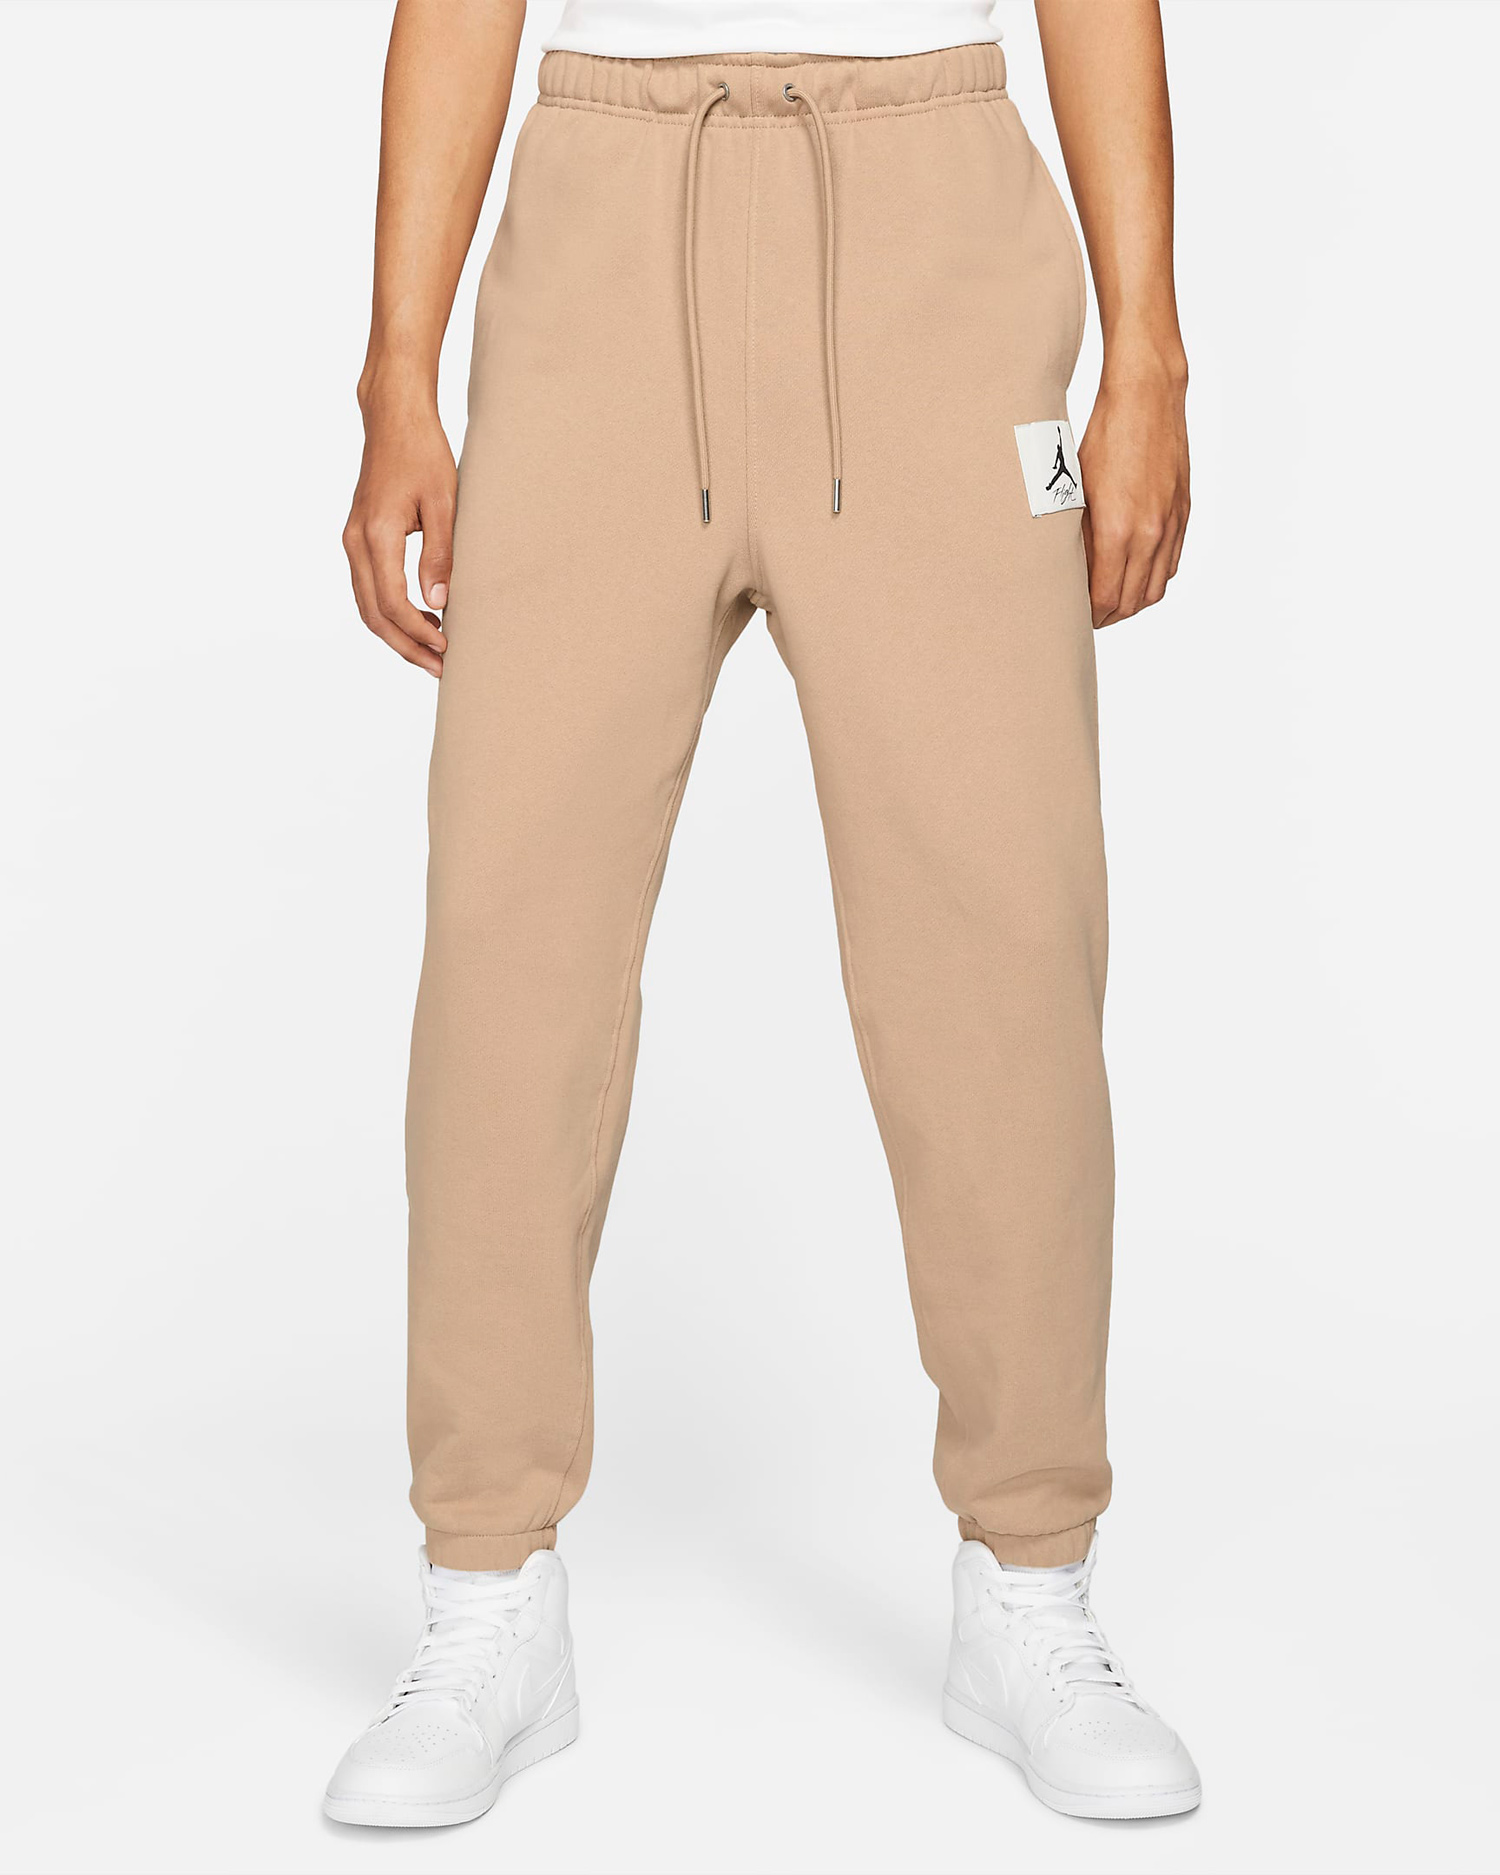 jordan-hemp-essential-flight-fleece-pants-1